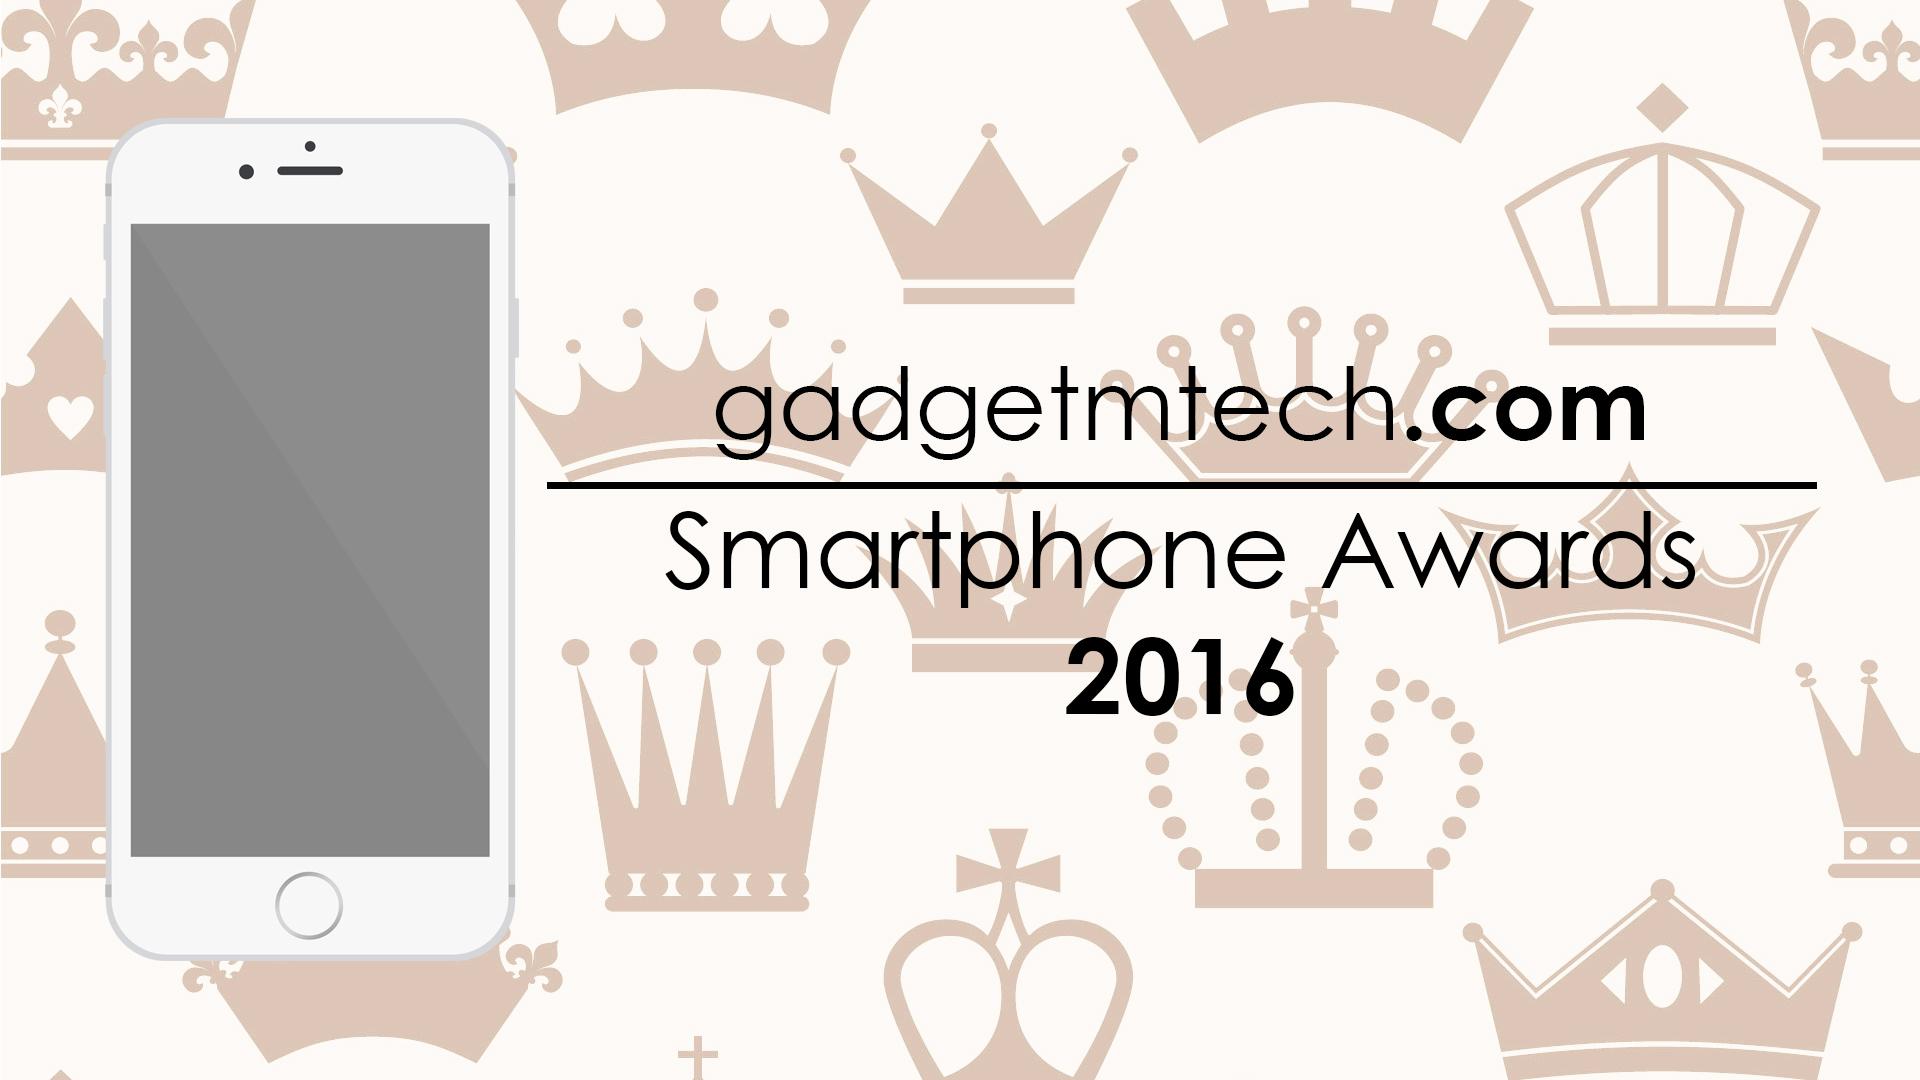 Smartphone Awards 2016